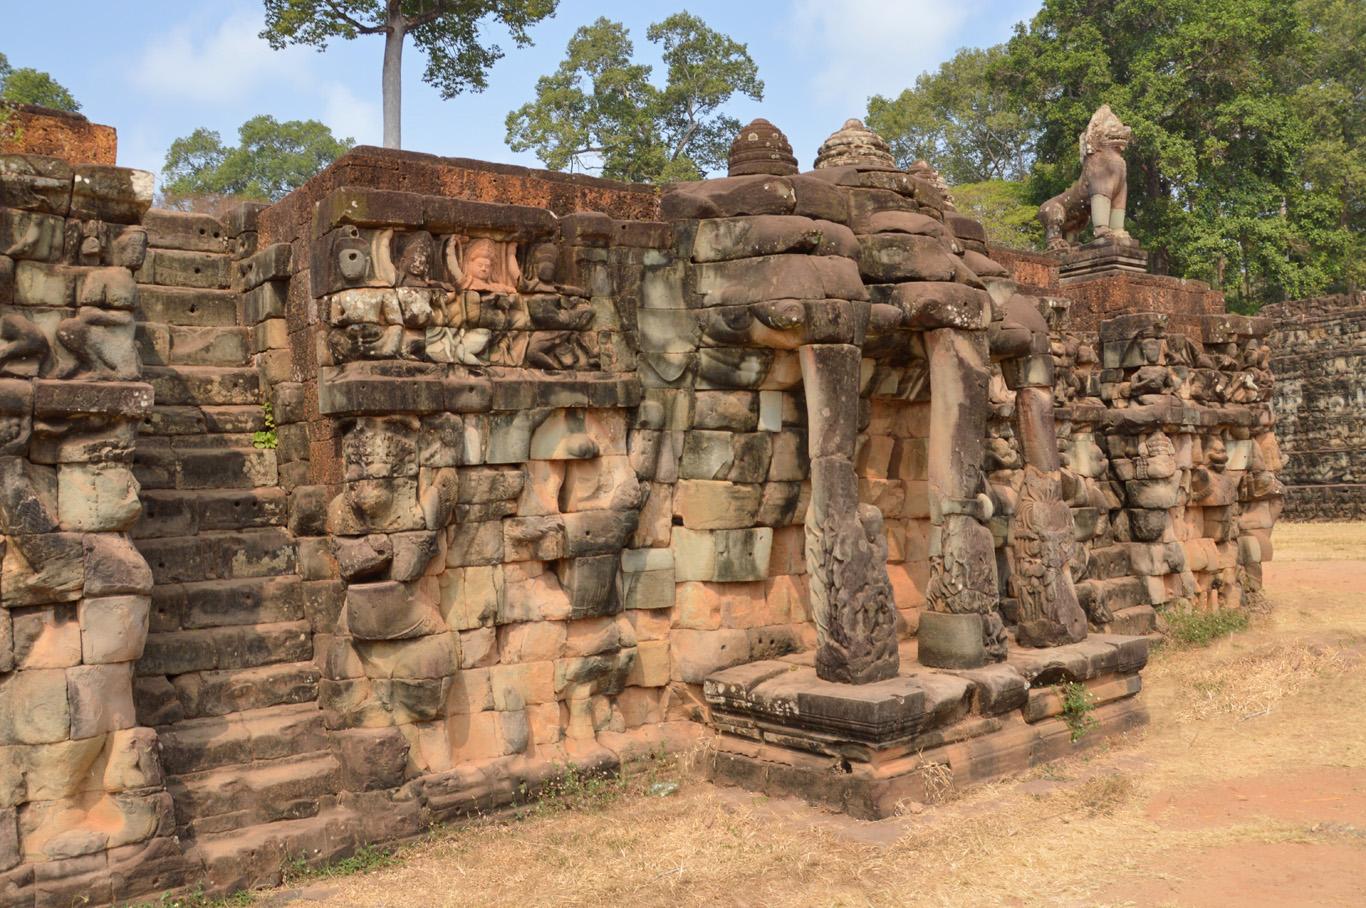 Angkor Thom - The terrace of the elephants